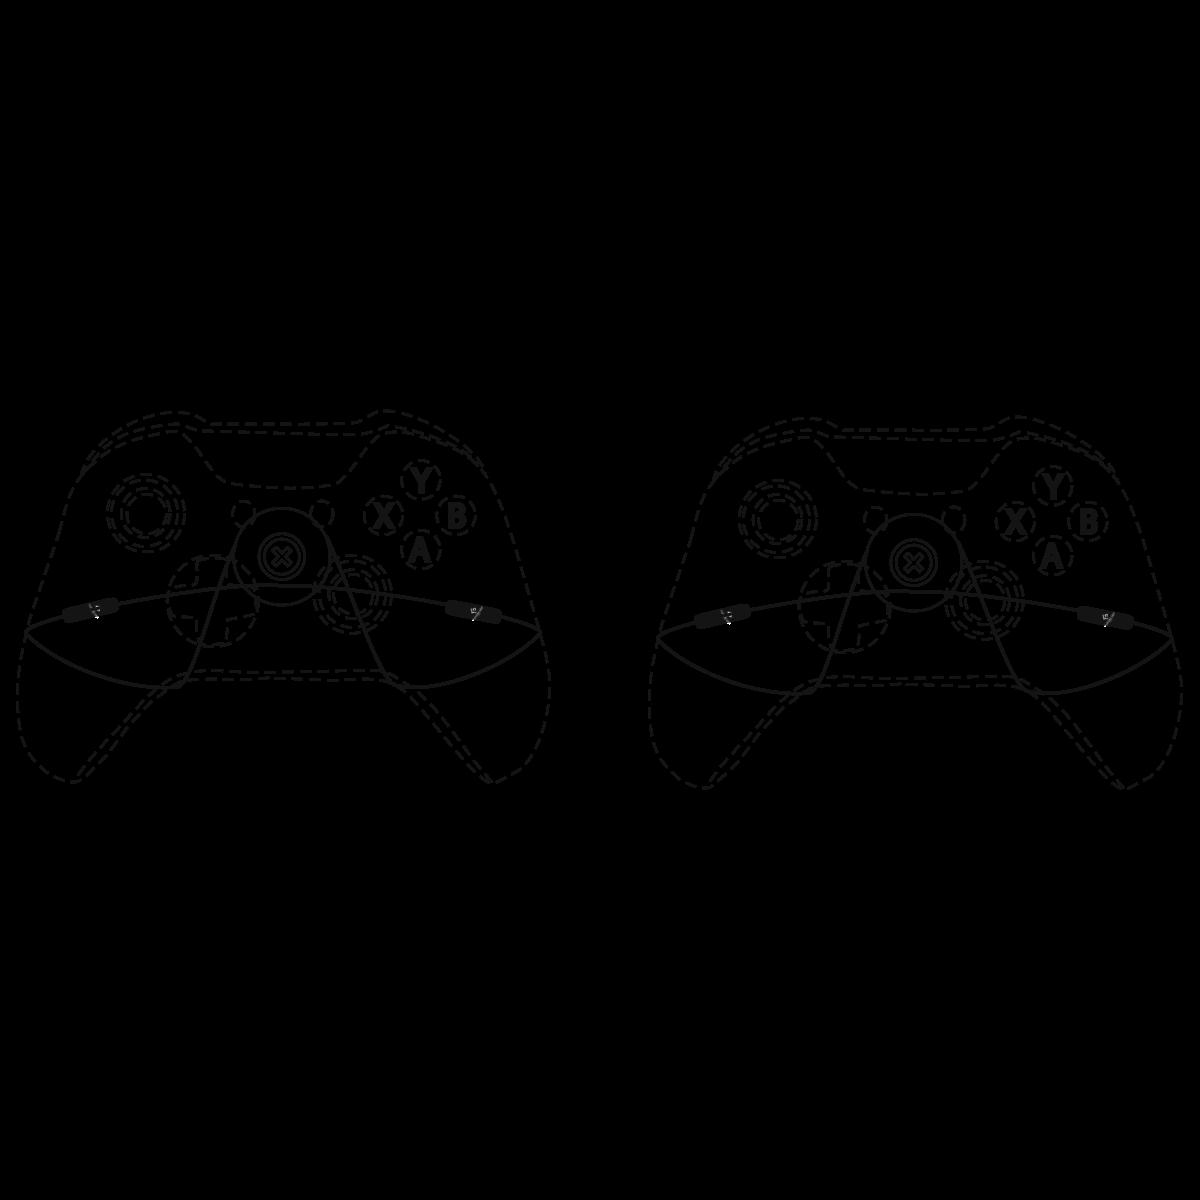 Gaming Controller Drawing At Getdrawings